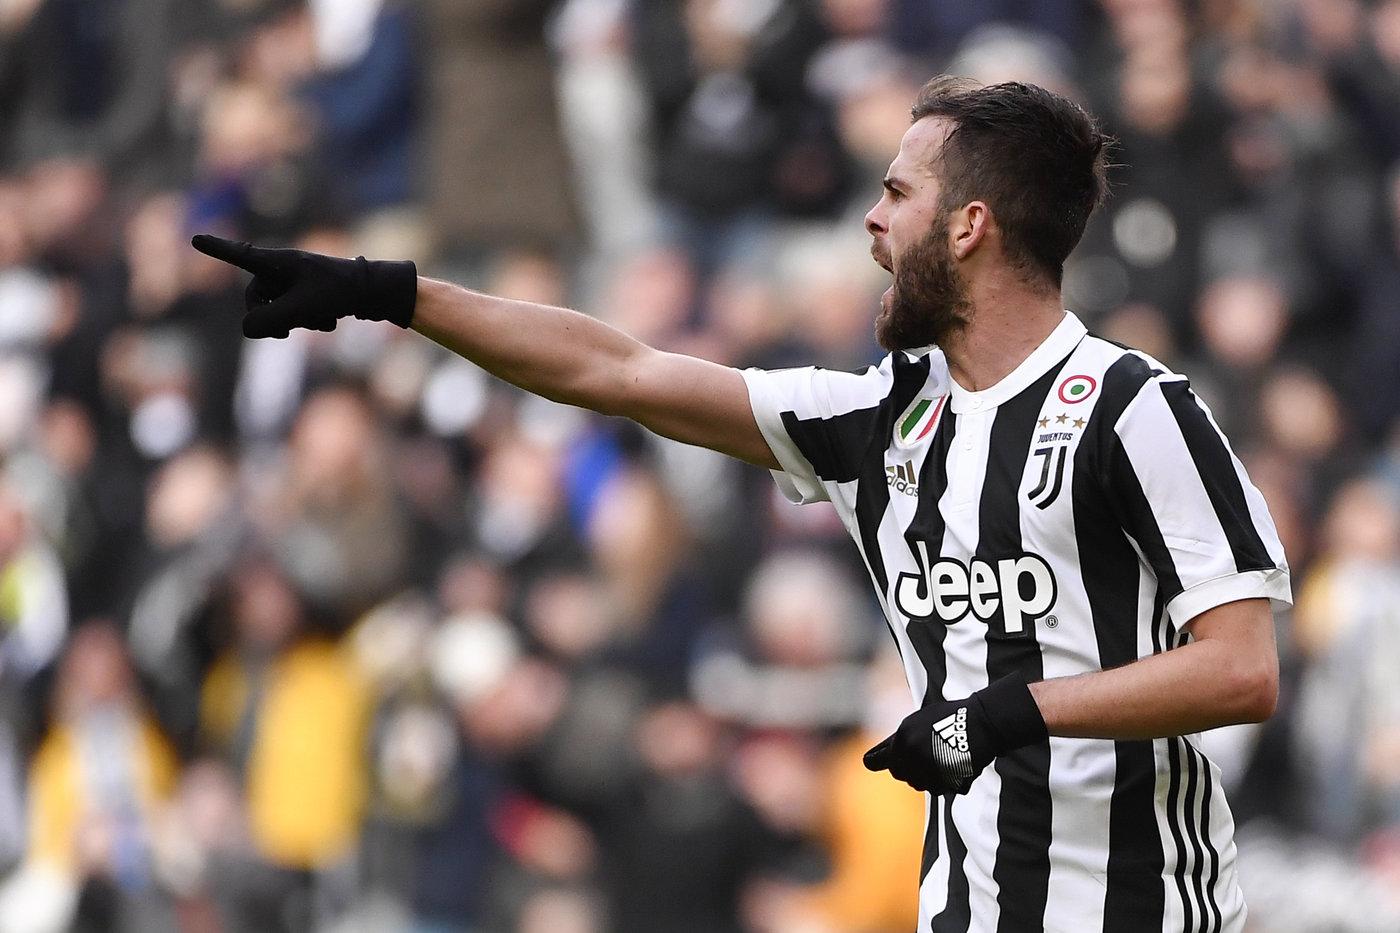 Mercato Juventus 30 giugno